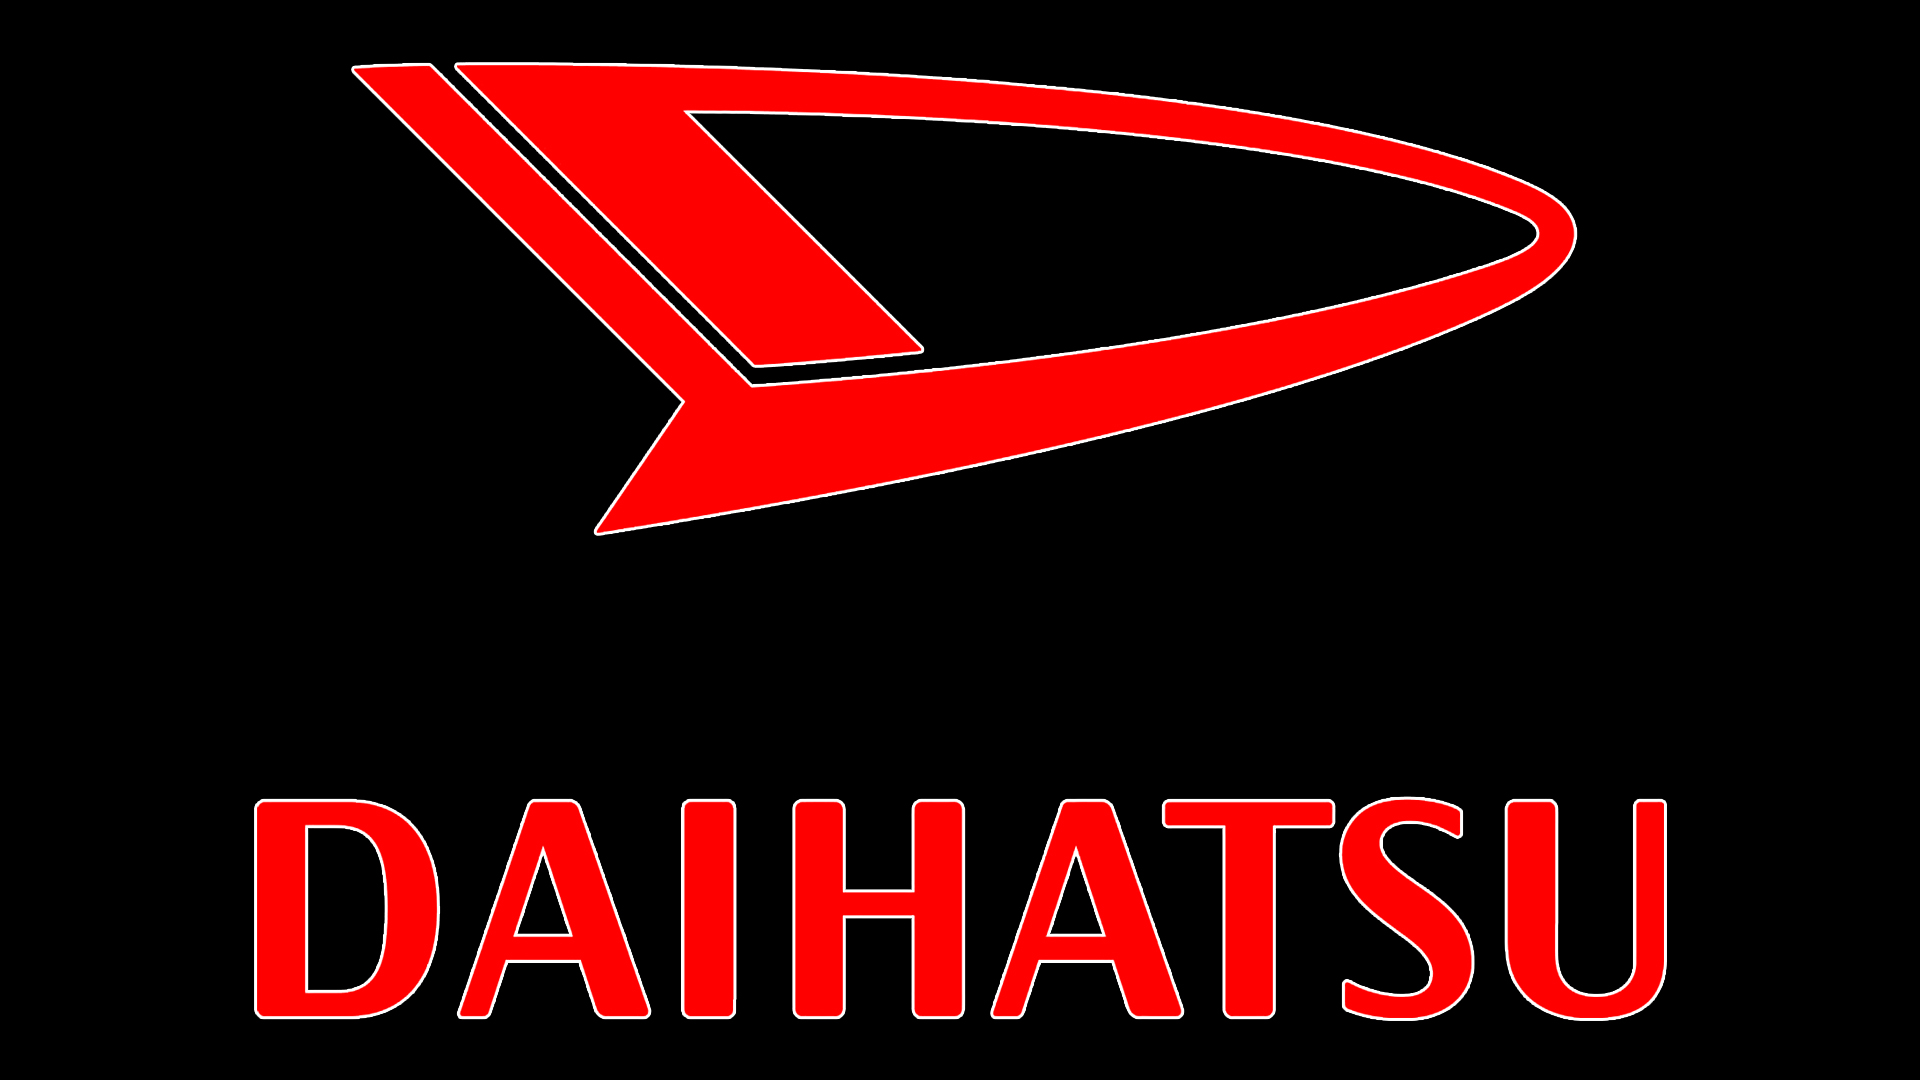 daihatsu logo meaning and history latest models world